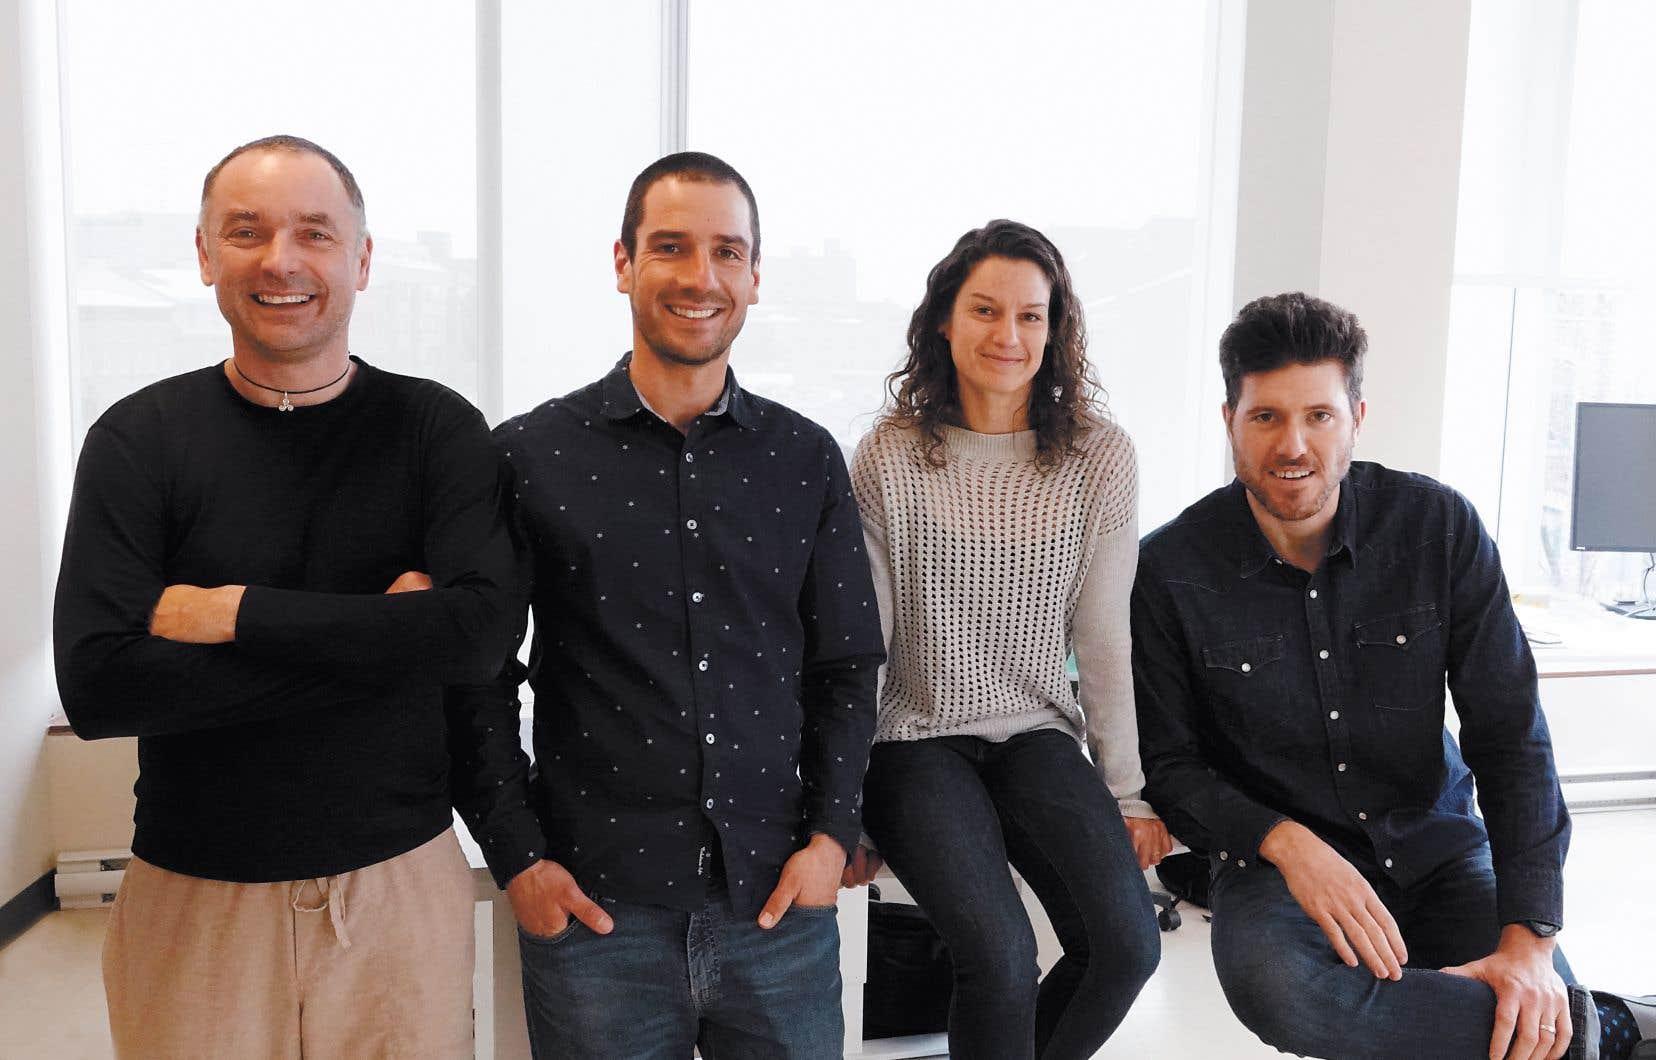 De gauche à droite: Erwan Gloaguen, Martin Blouin, Véronique Prince et Lorenzo Perozzi.